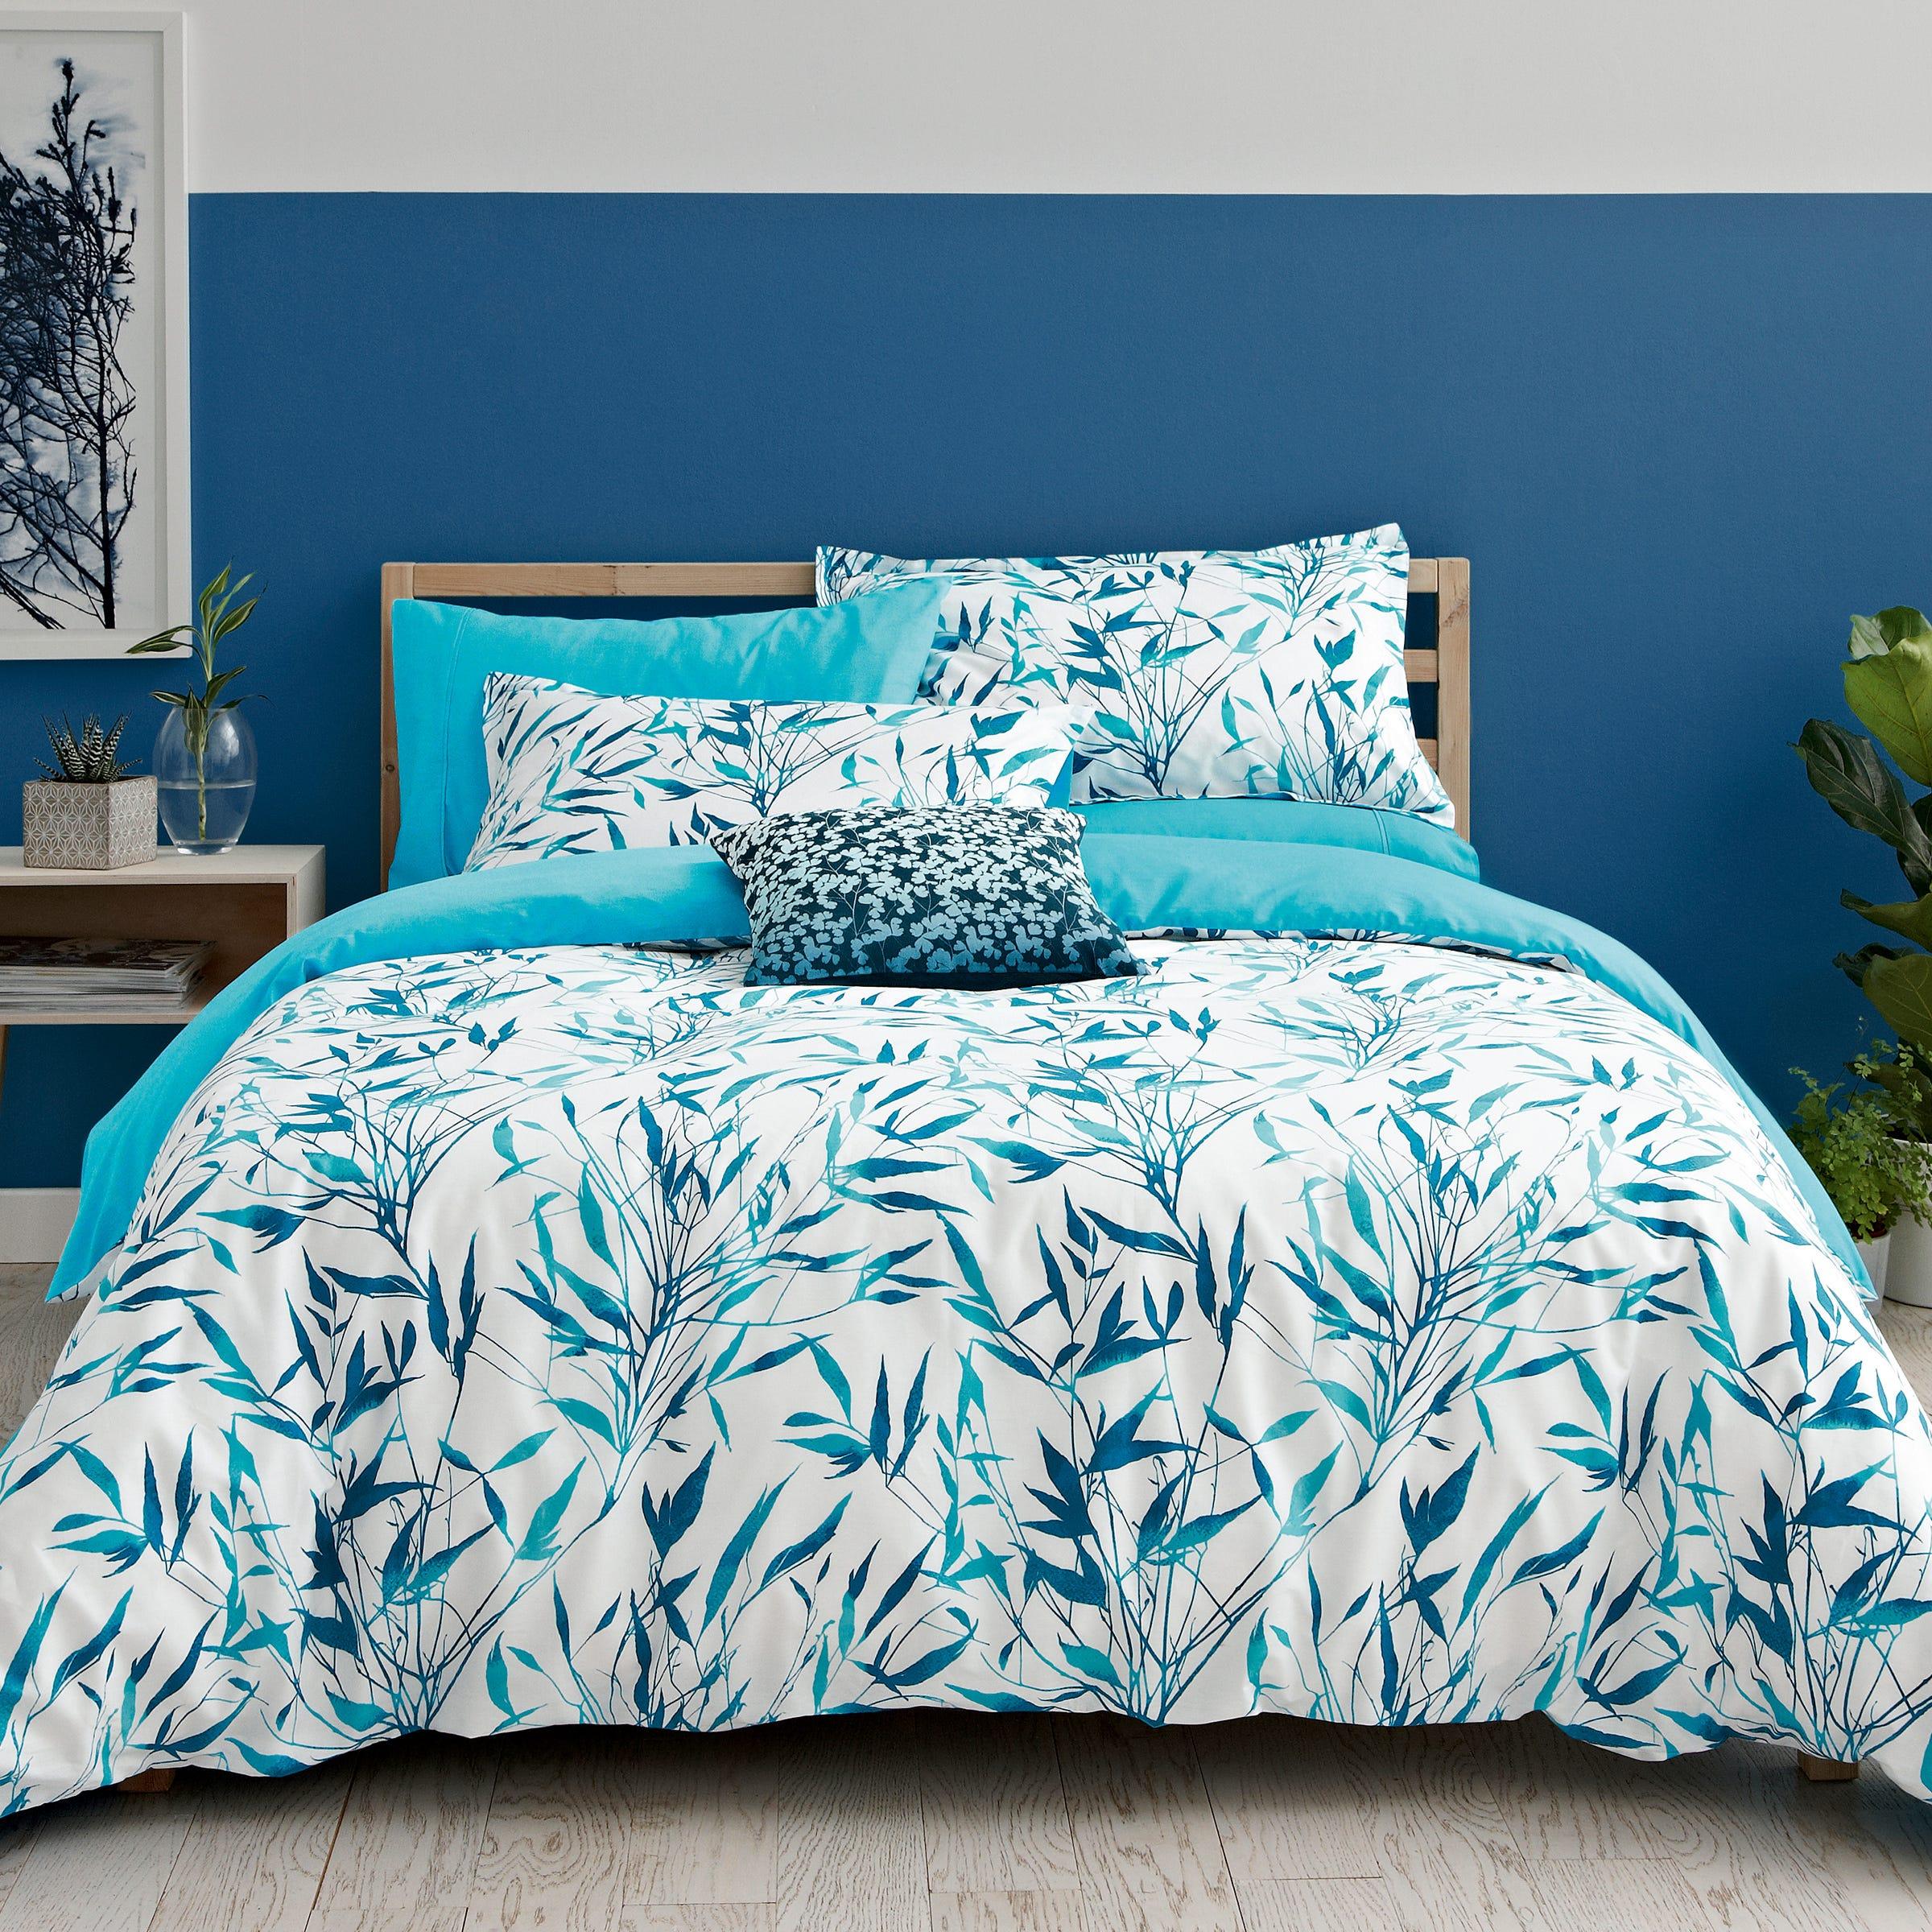 Clarissa Hulse Bedding Bamboo Super Kingsize Duvet Cover Turquoise